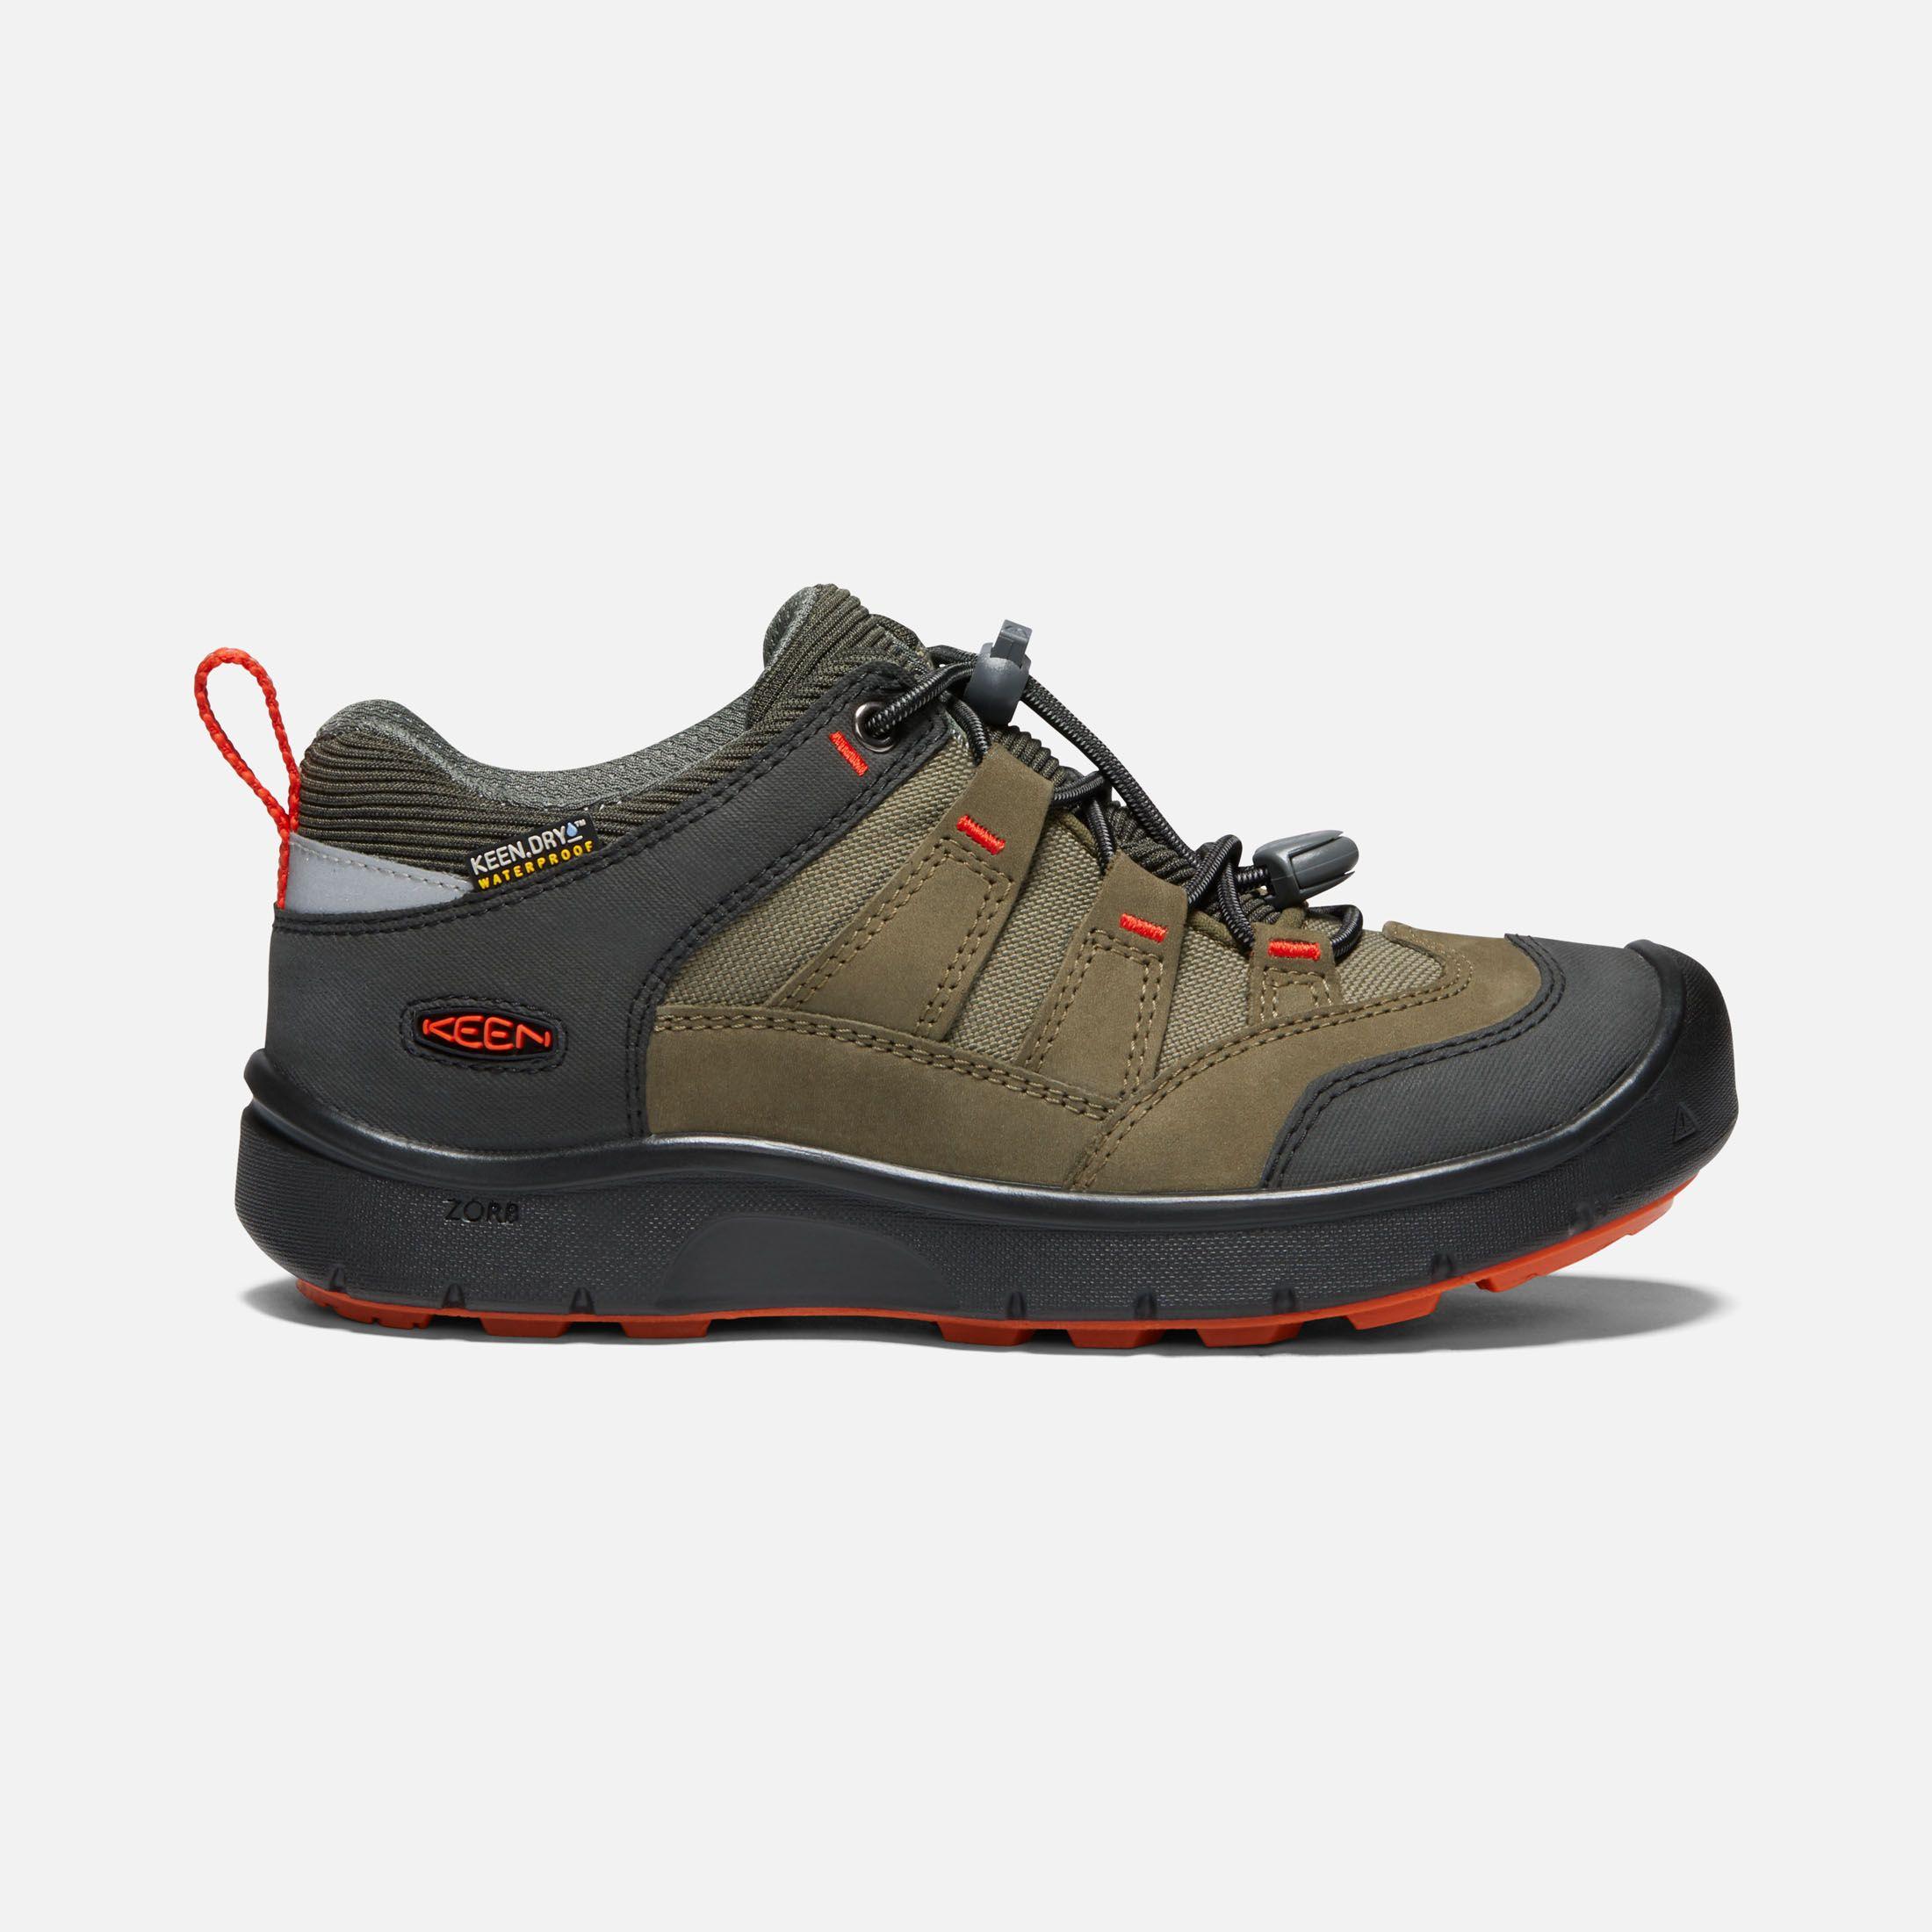 KEEN Kids Hikeport Wp Hiking Shoe